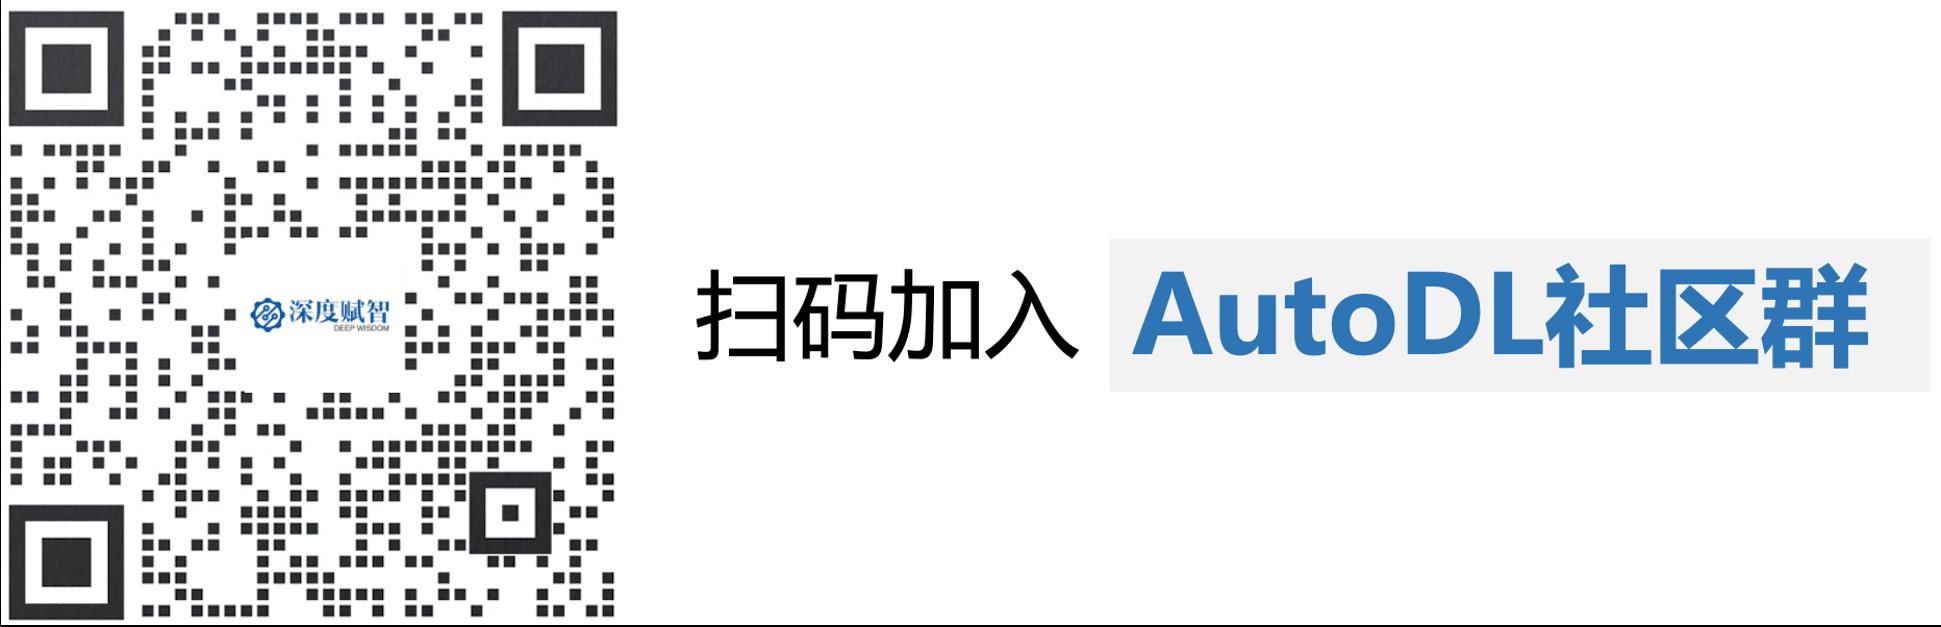 AutoDL社区